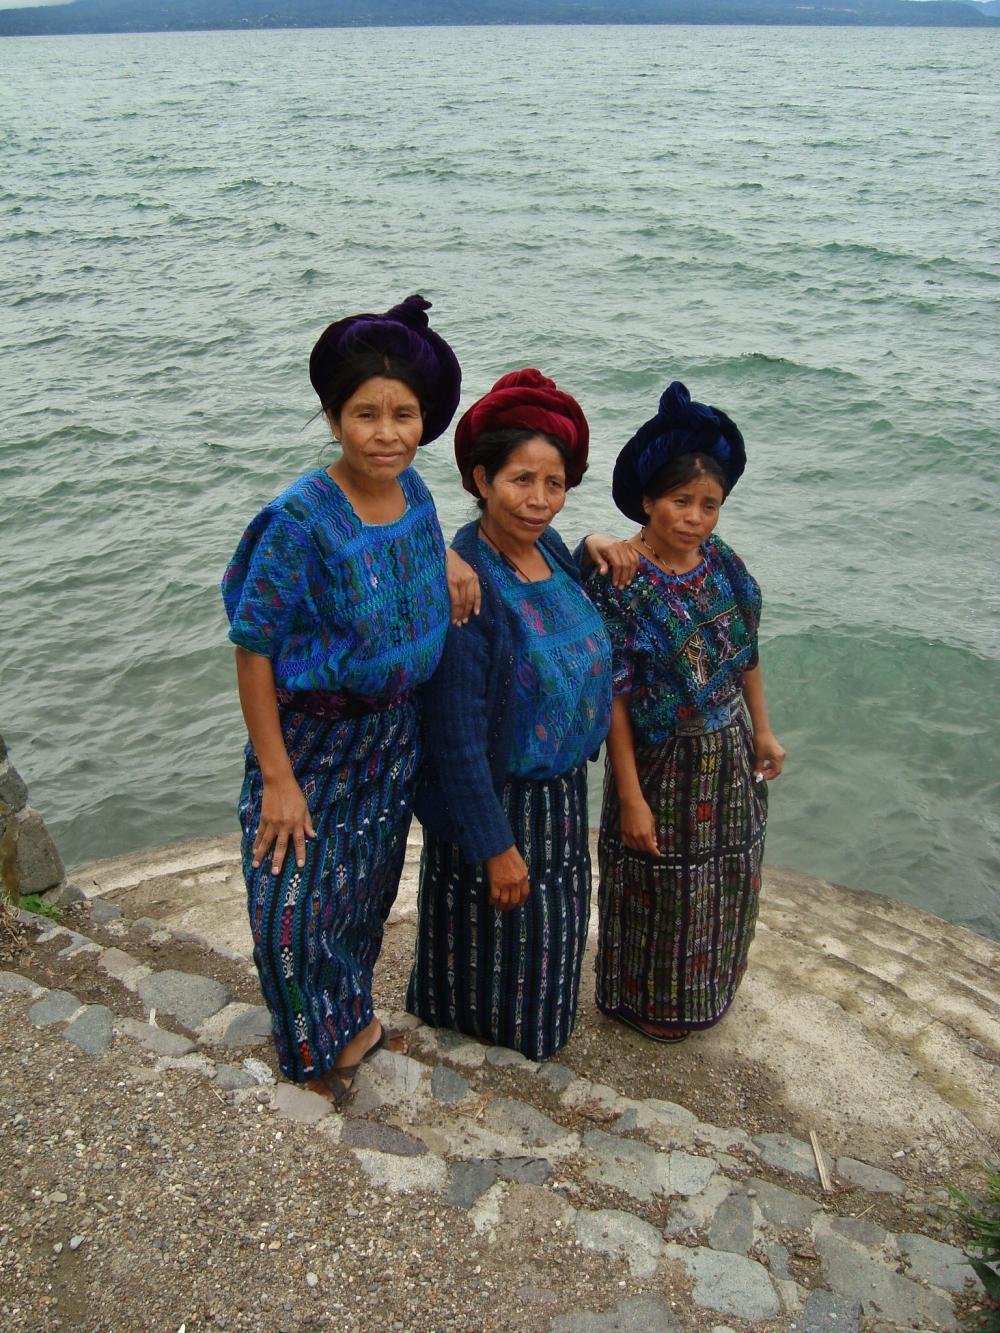 Guatemaltecas de la etnia Maya